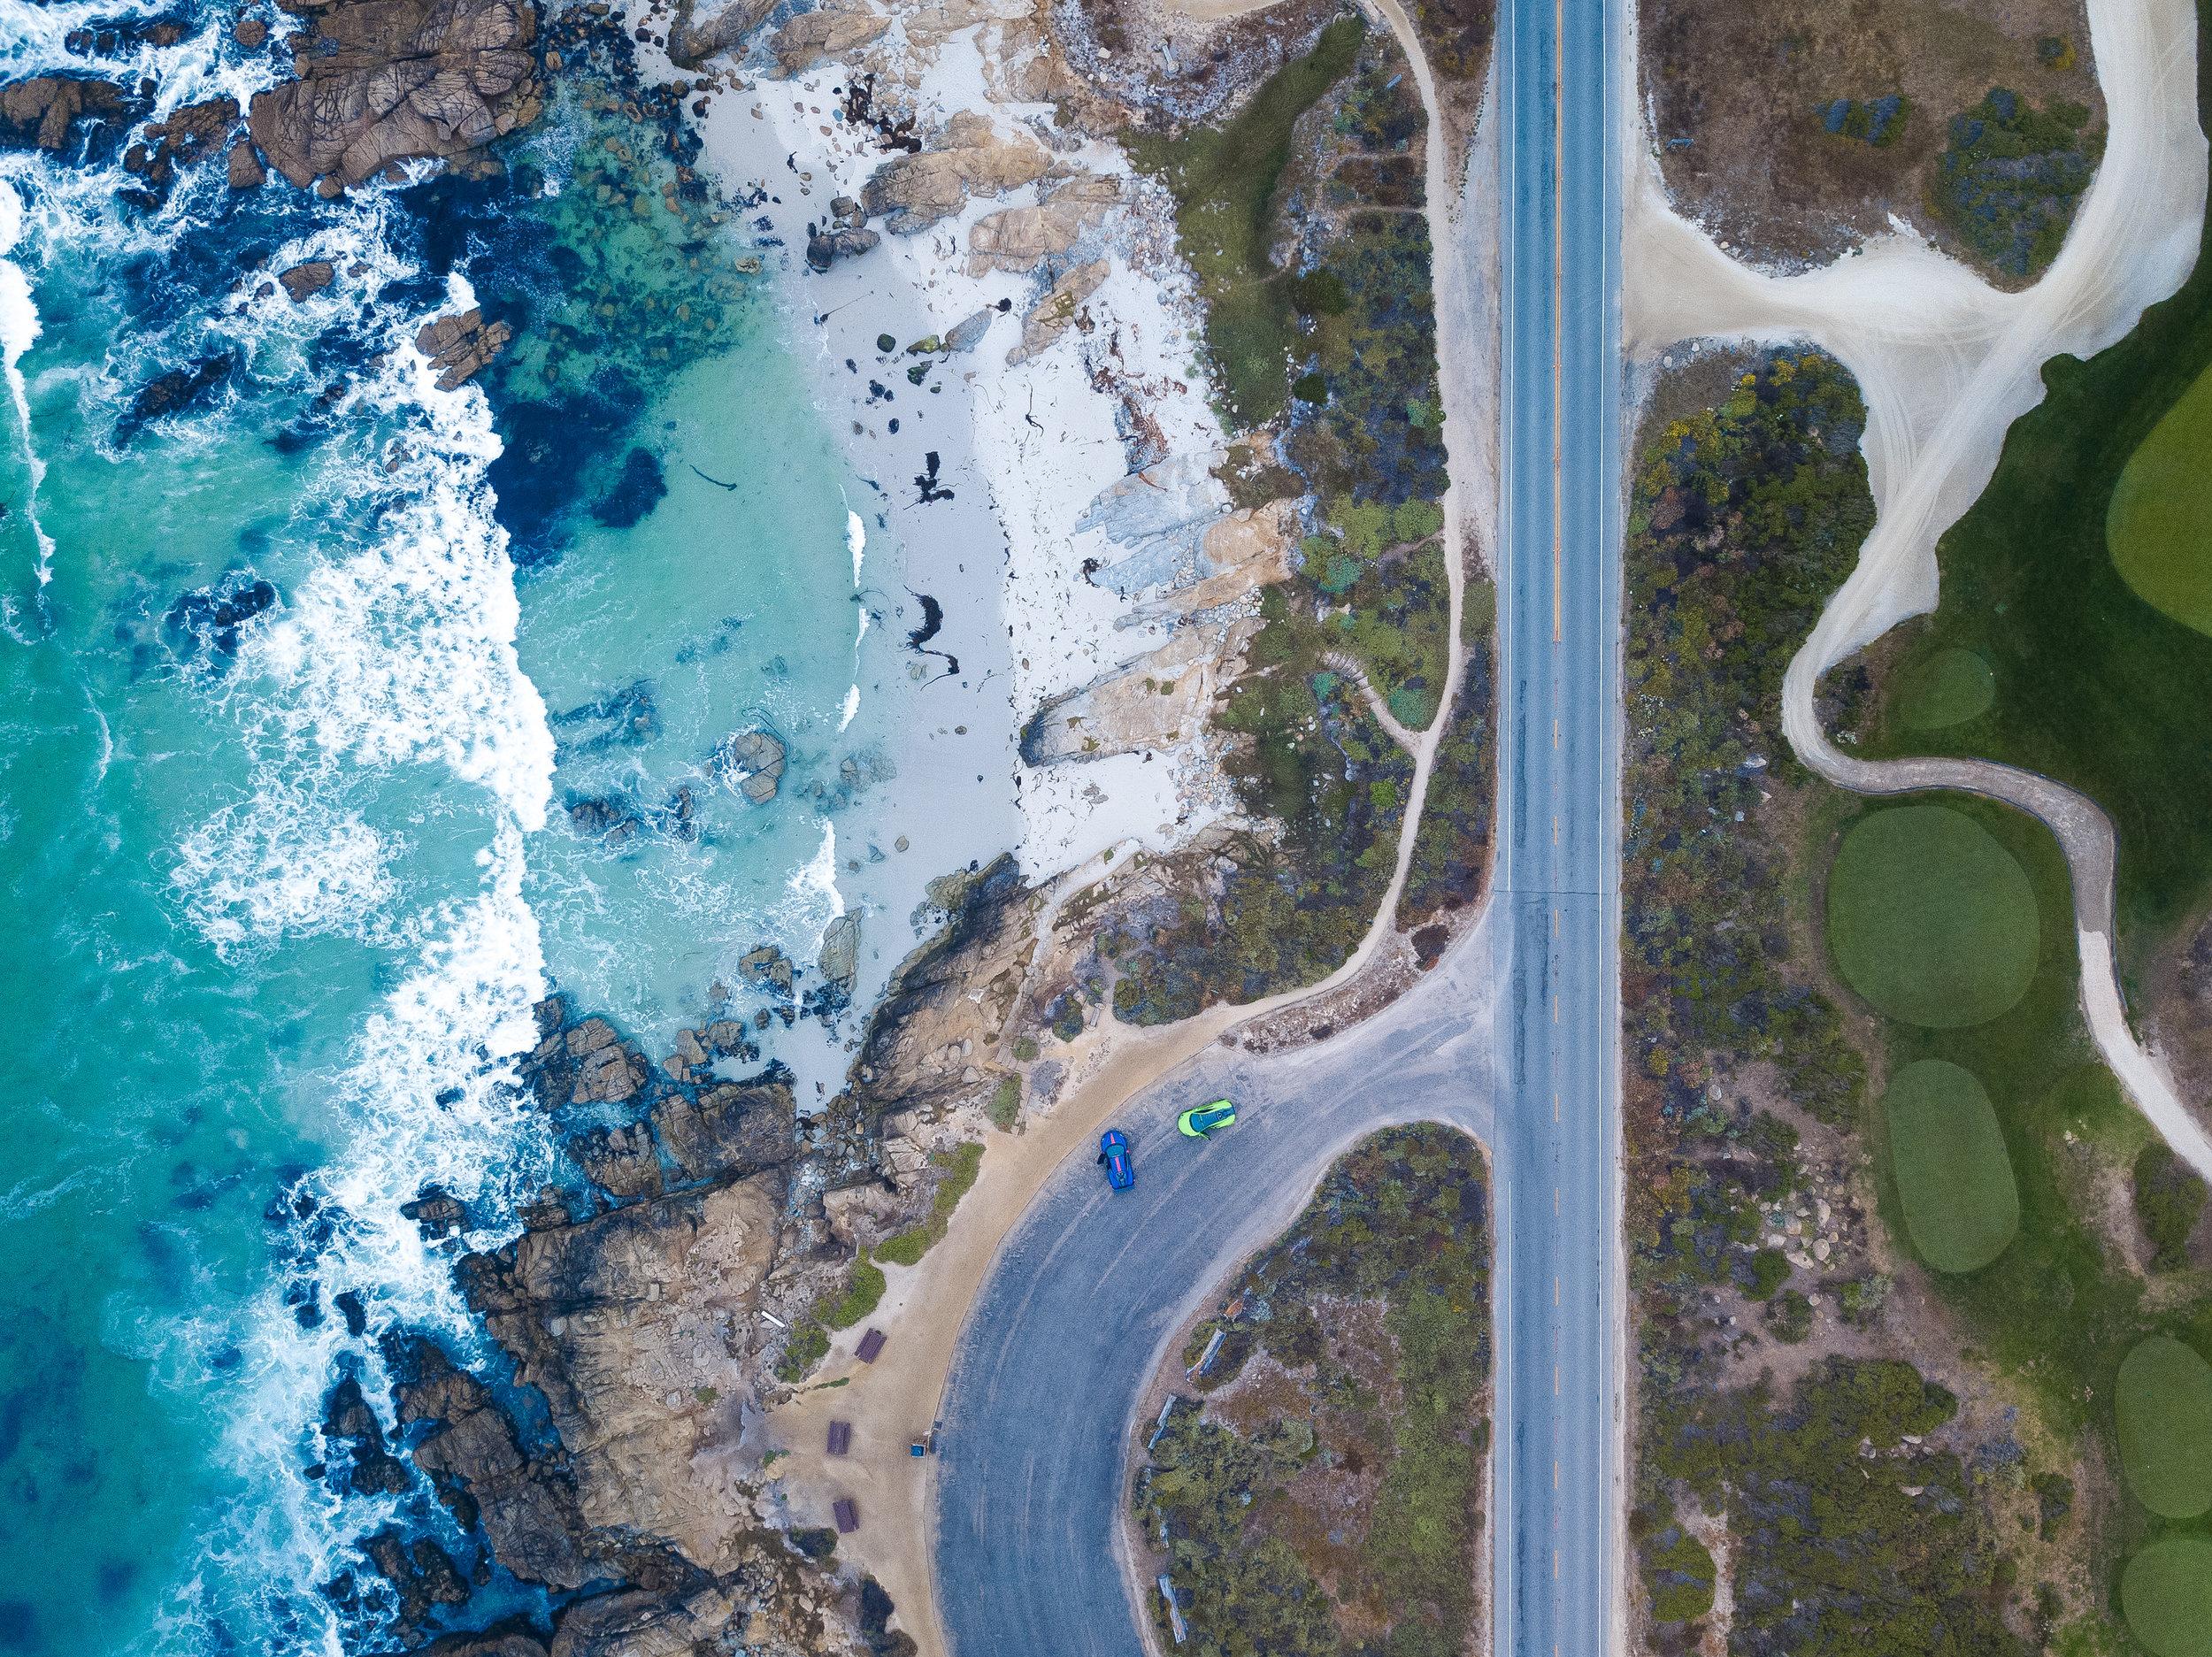 Stay_Driven_Monterey_Mclarens_DRONE-14.jpg